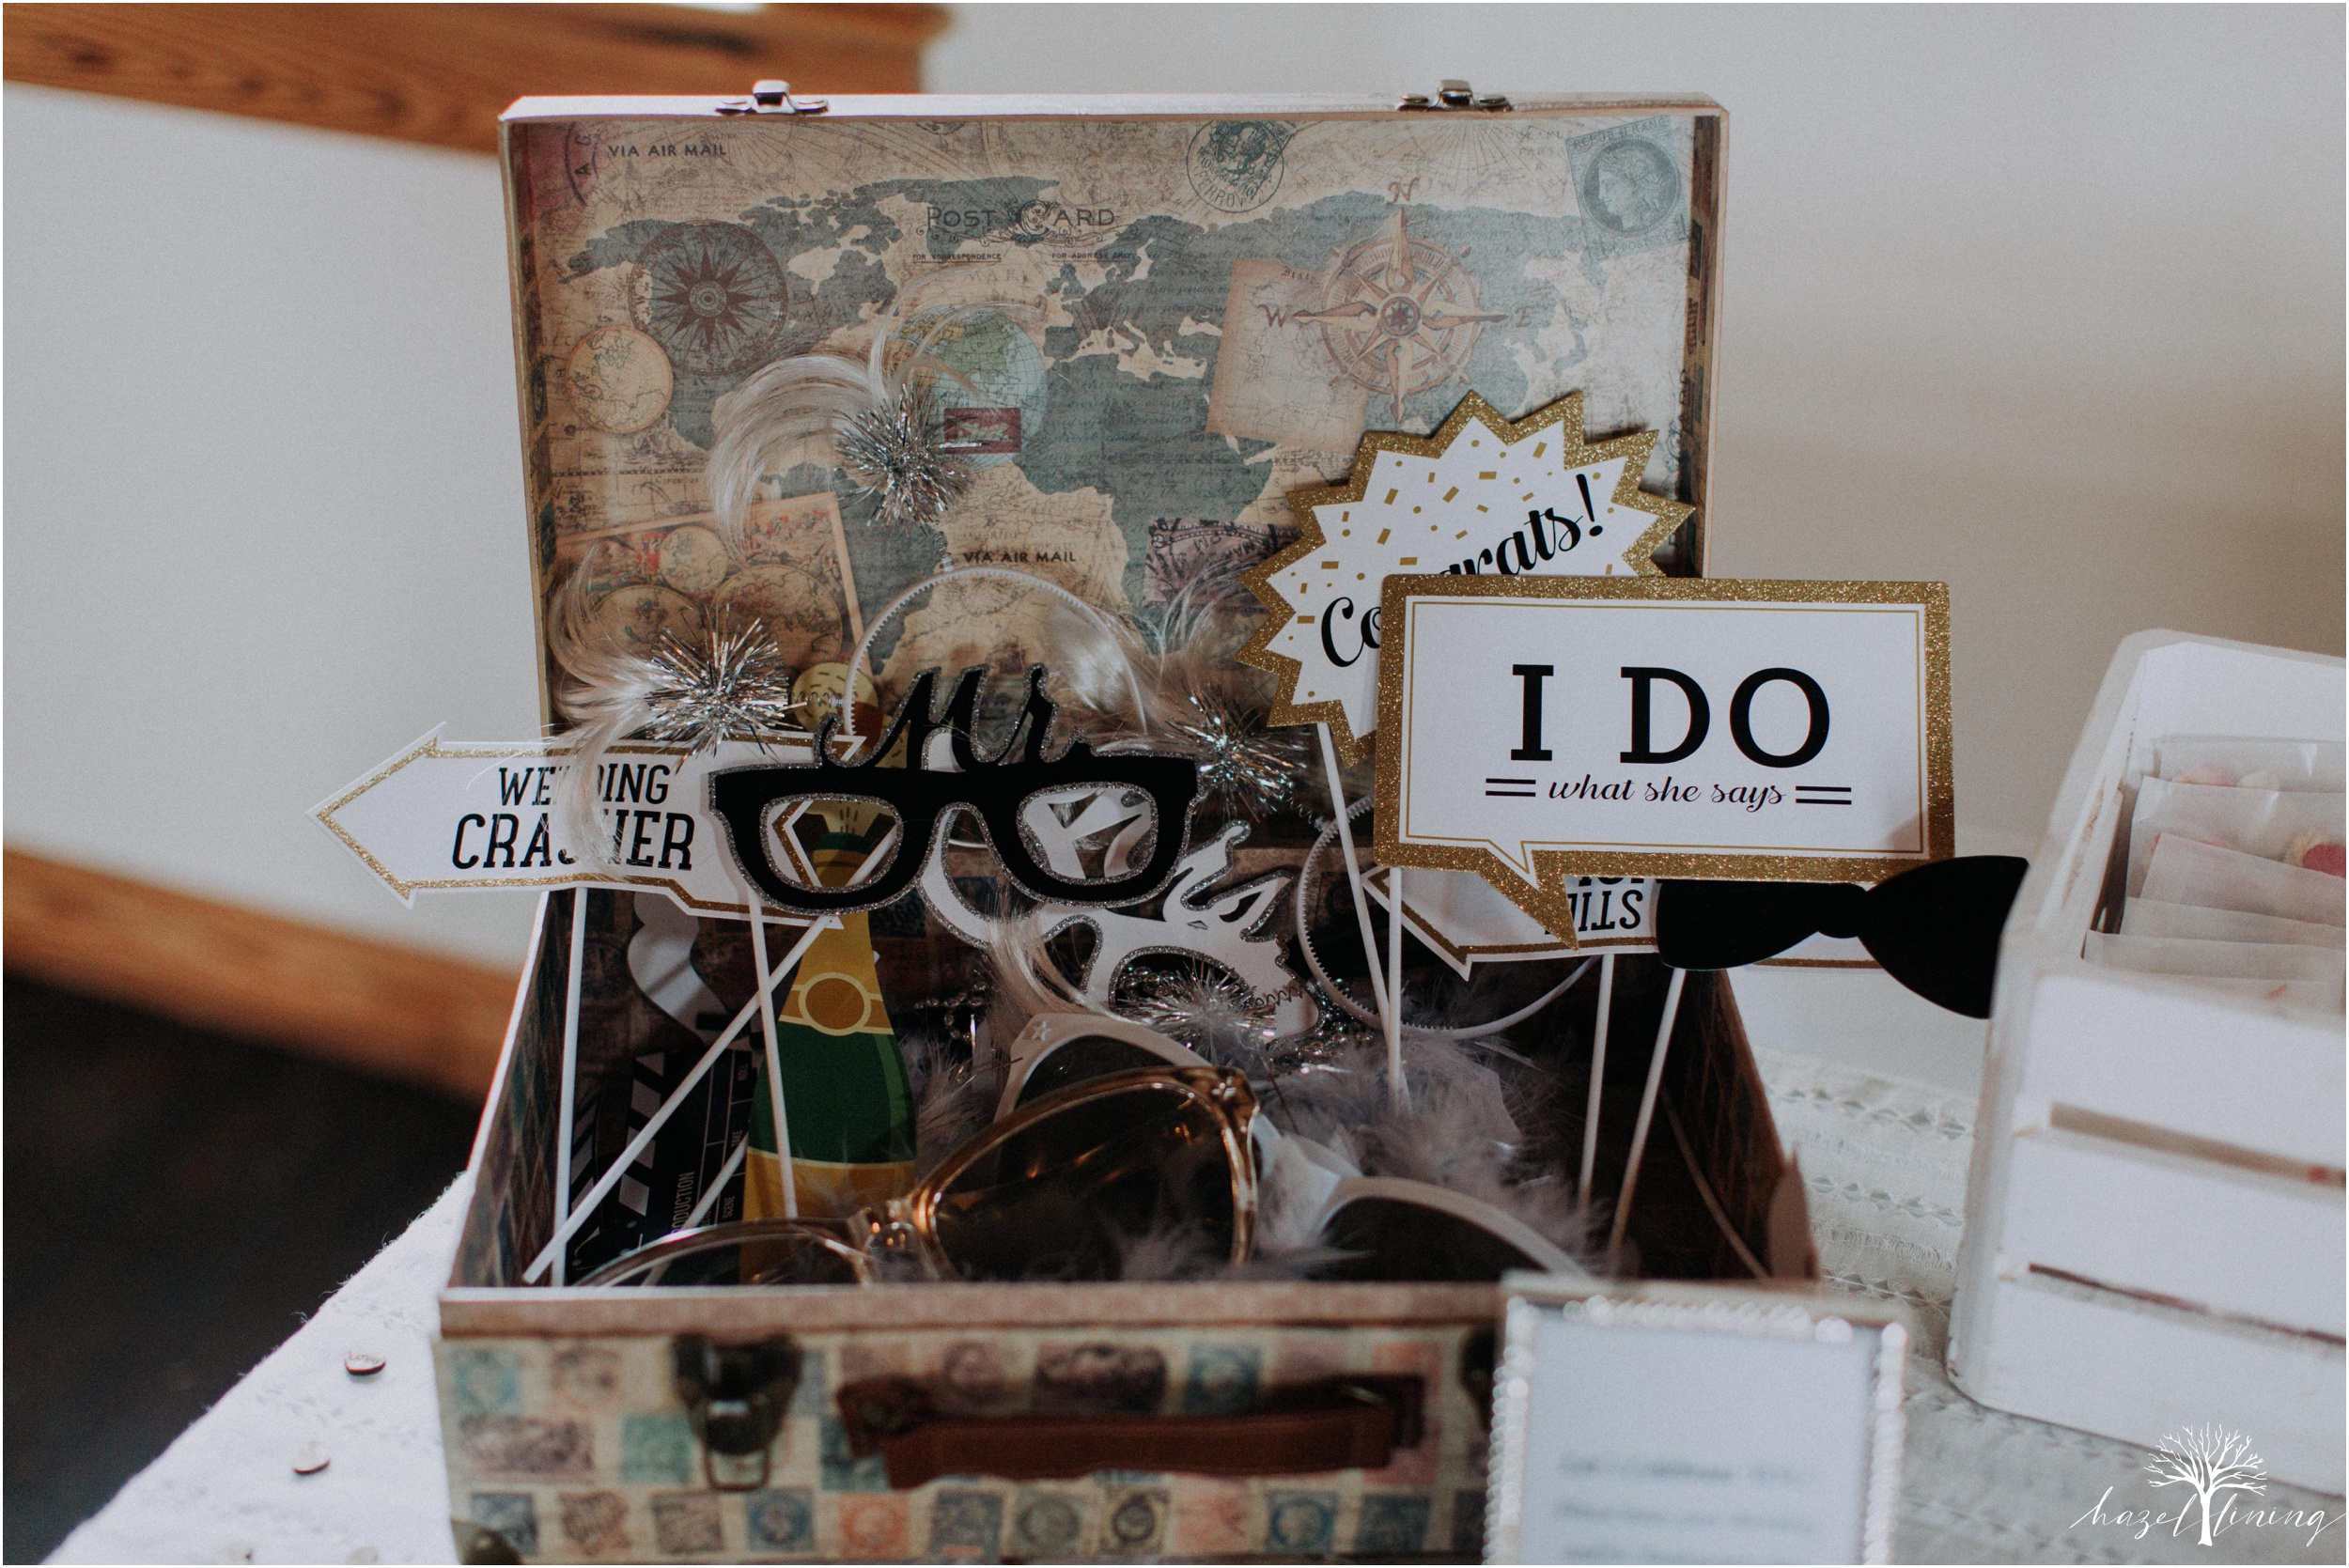 mariah-kreyling-samuel-sherratt-sherrattwiththeworld-peirce-farm-at-witch-hill-boston-massachusetts-wedding-photography-hazel-lining-travel-wedding-elopement-photography_0152.jpg